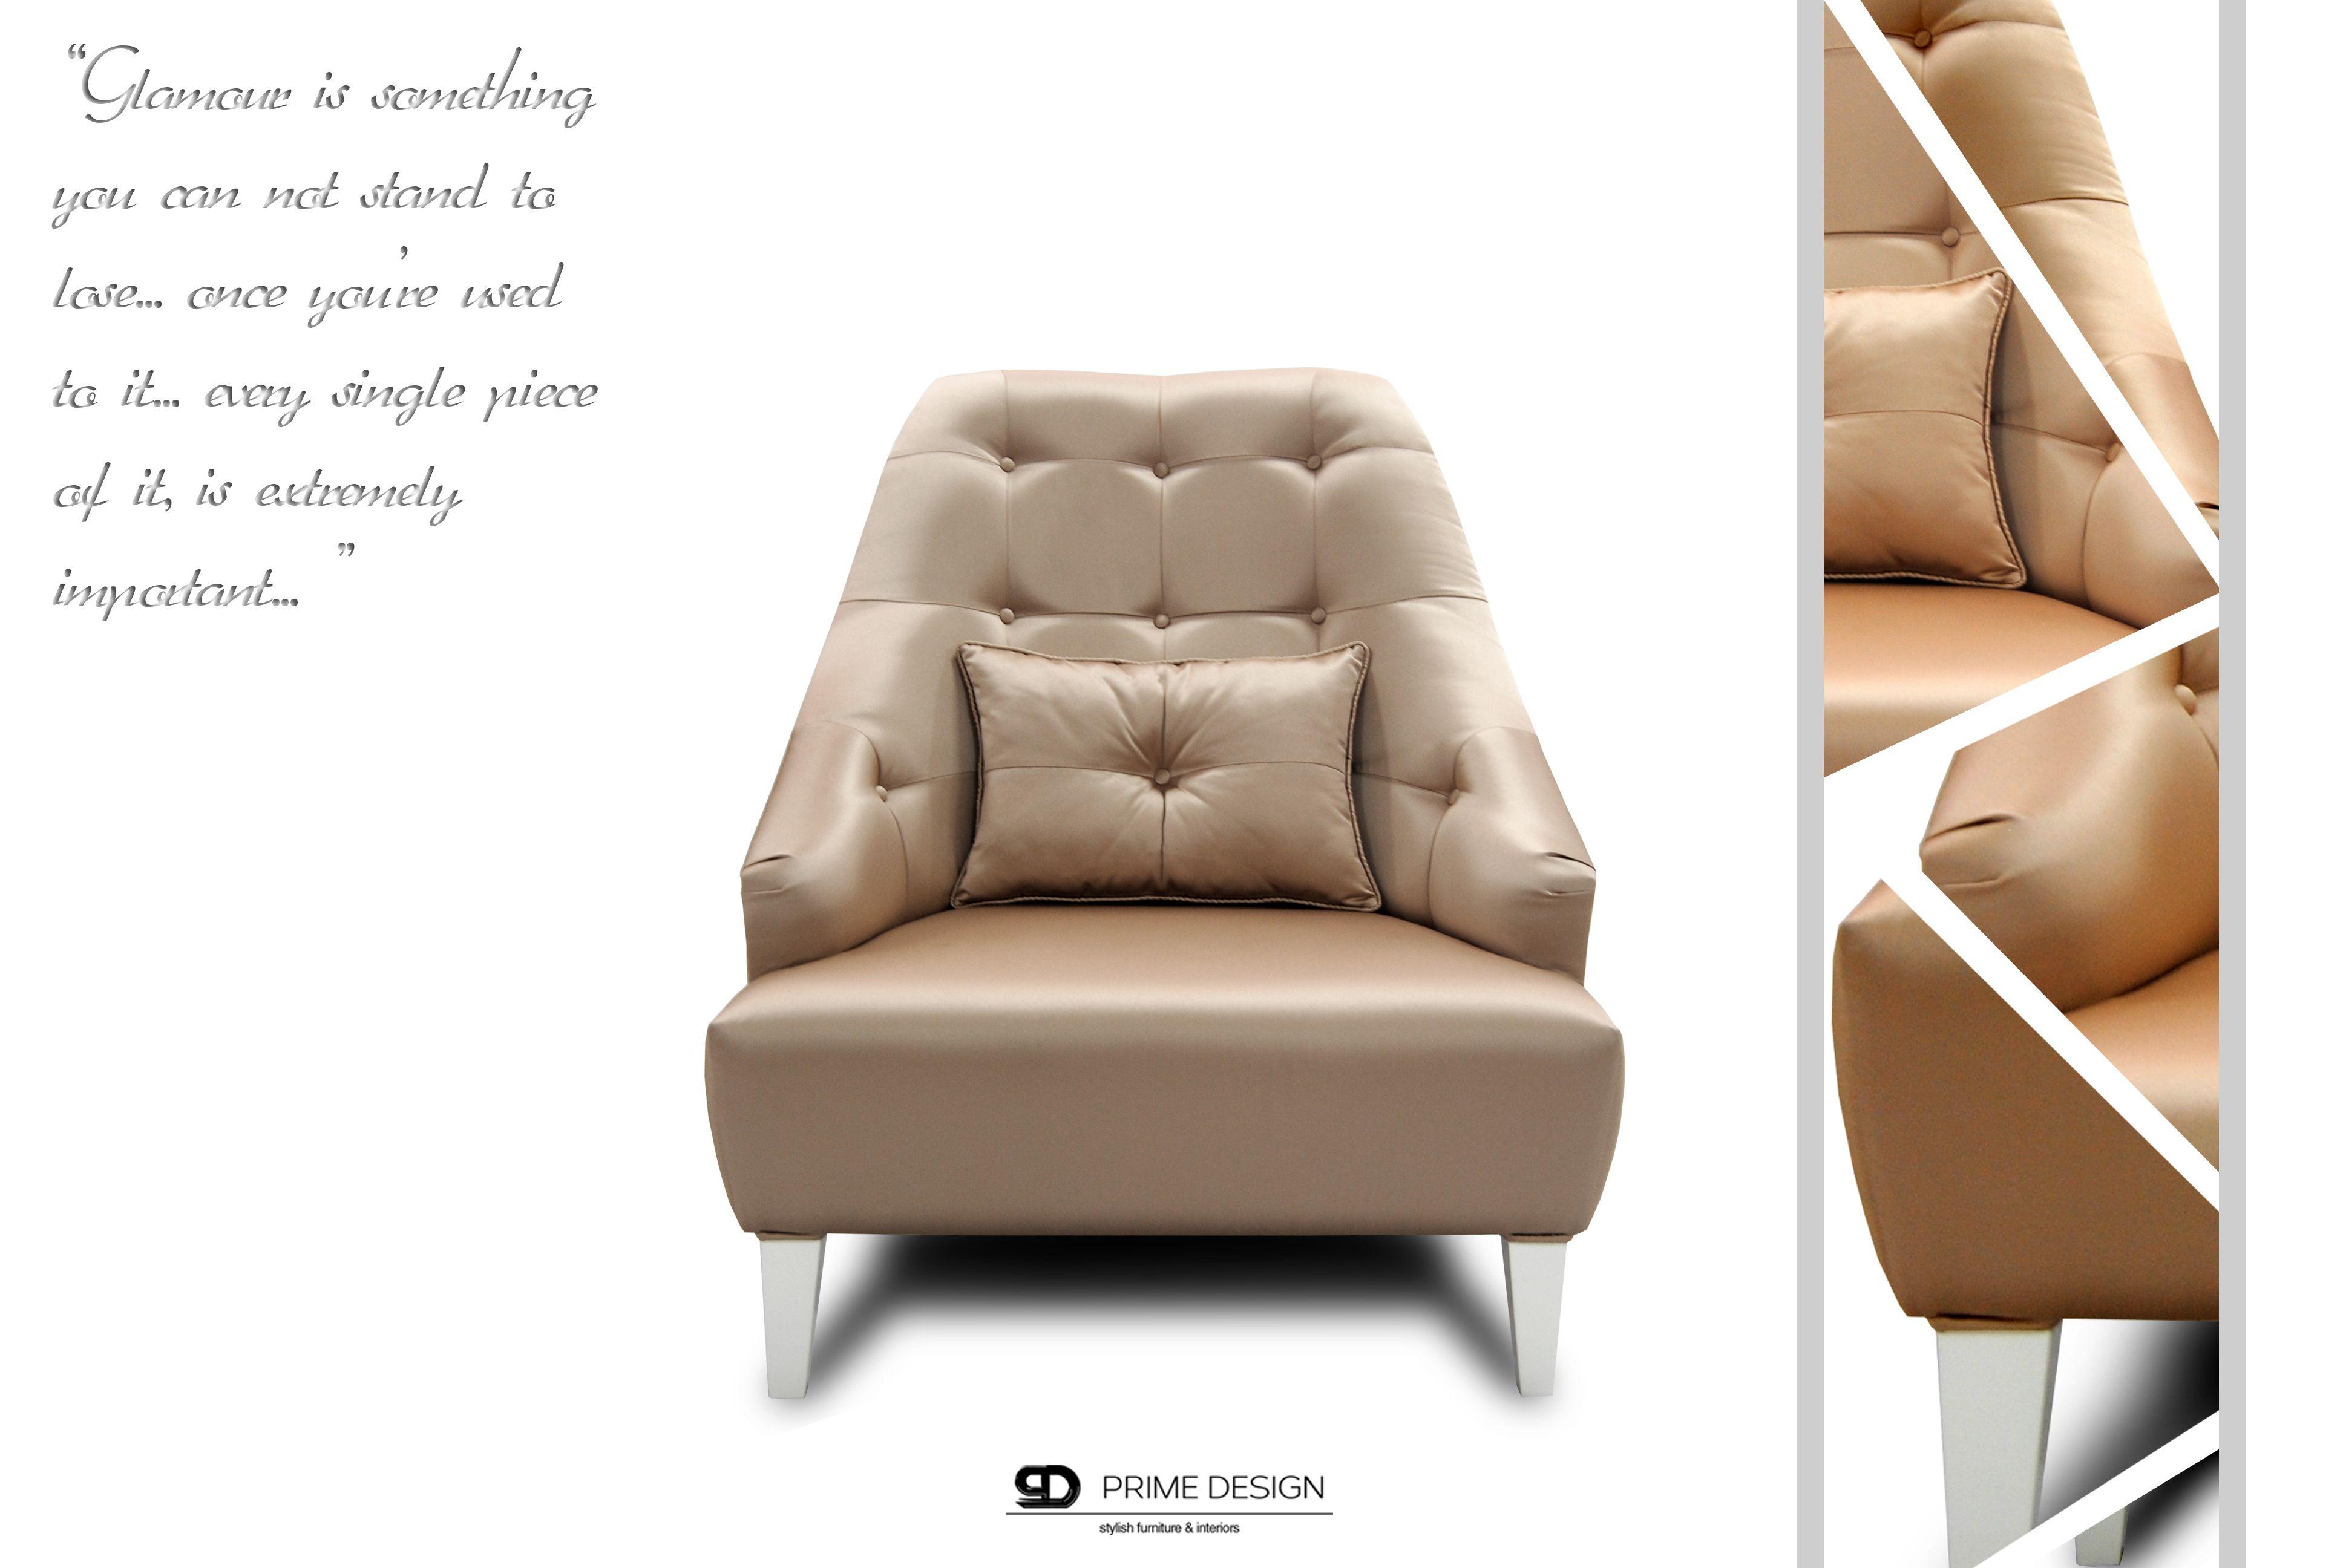 trend decoration 99 home furniture. #prime #passione #luxury #deluxe #product #design #manufacturing #home #Interior #Decor #furniture #contemporary #living #handcrafted #trend # Decoration Trend 99 Home Furniture N